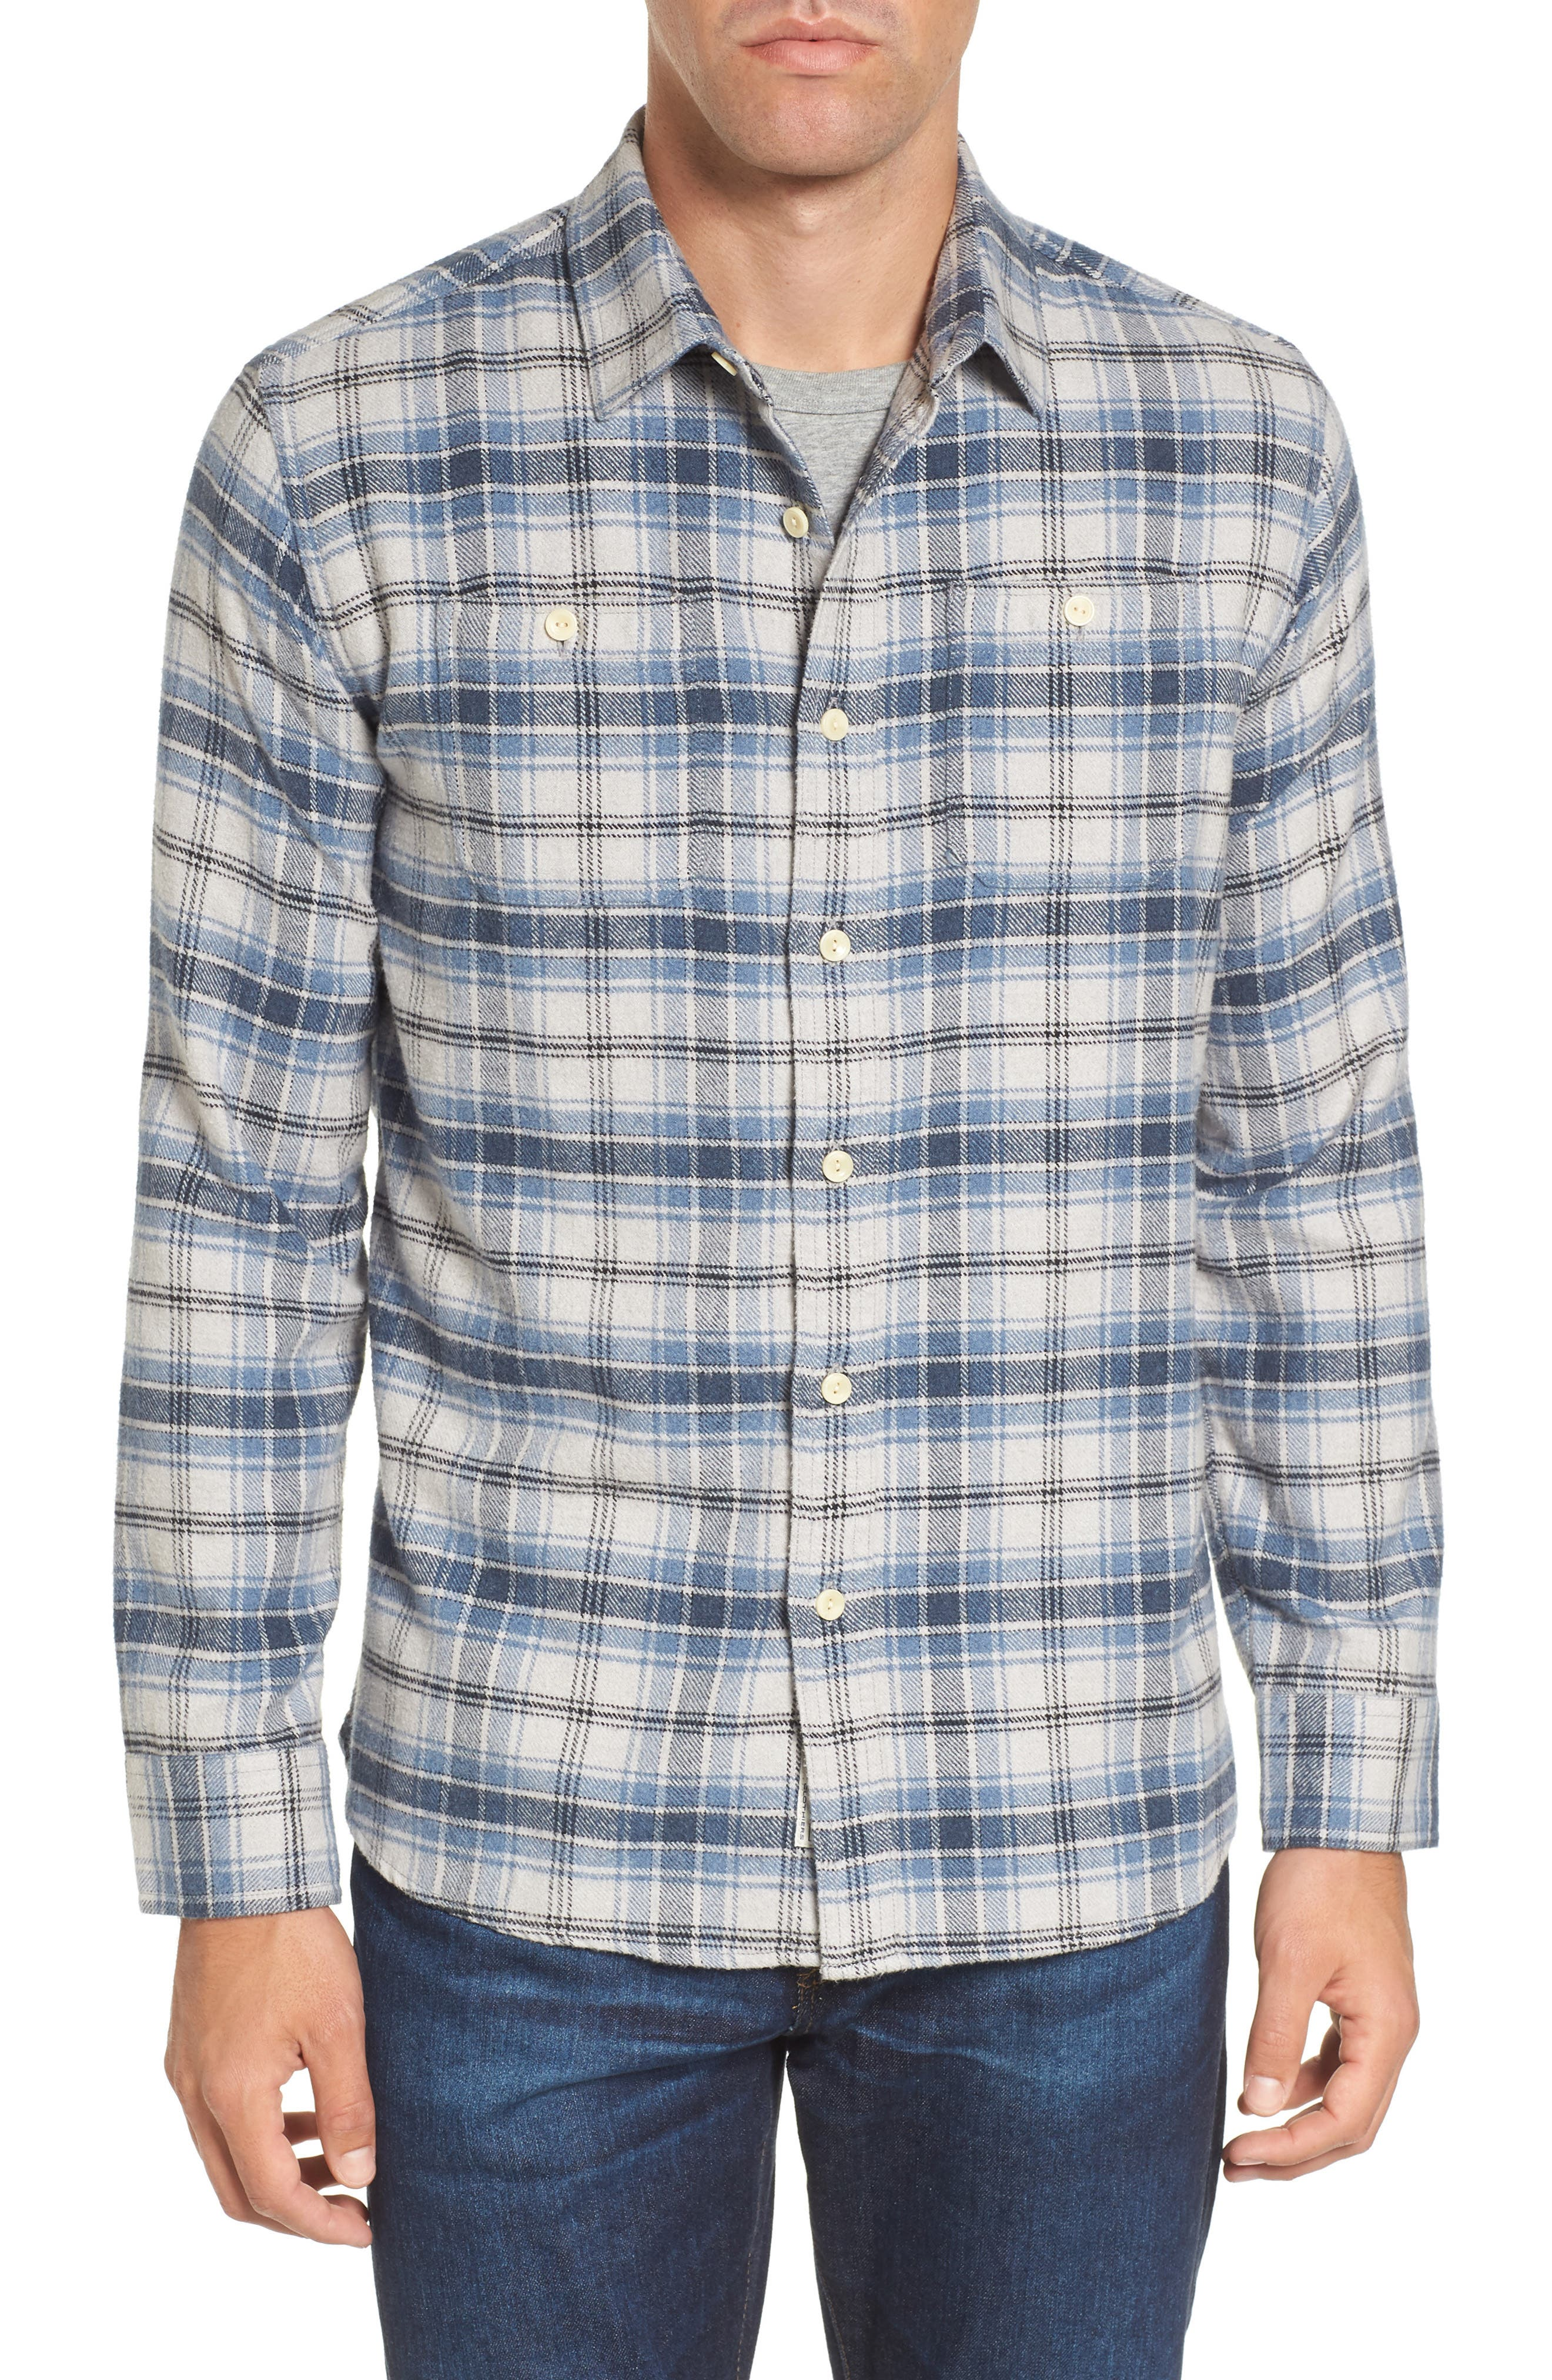 Main Image - Grayers Campton Heritage Plaid Flannel Shirt